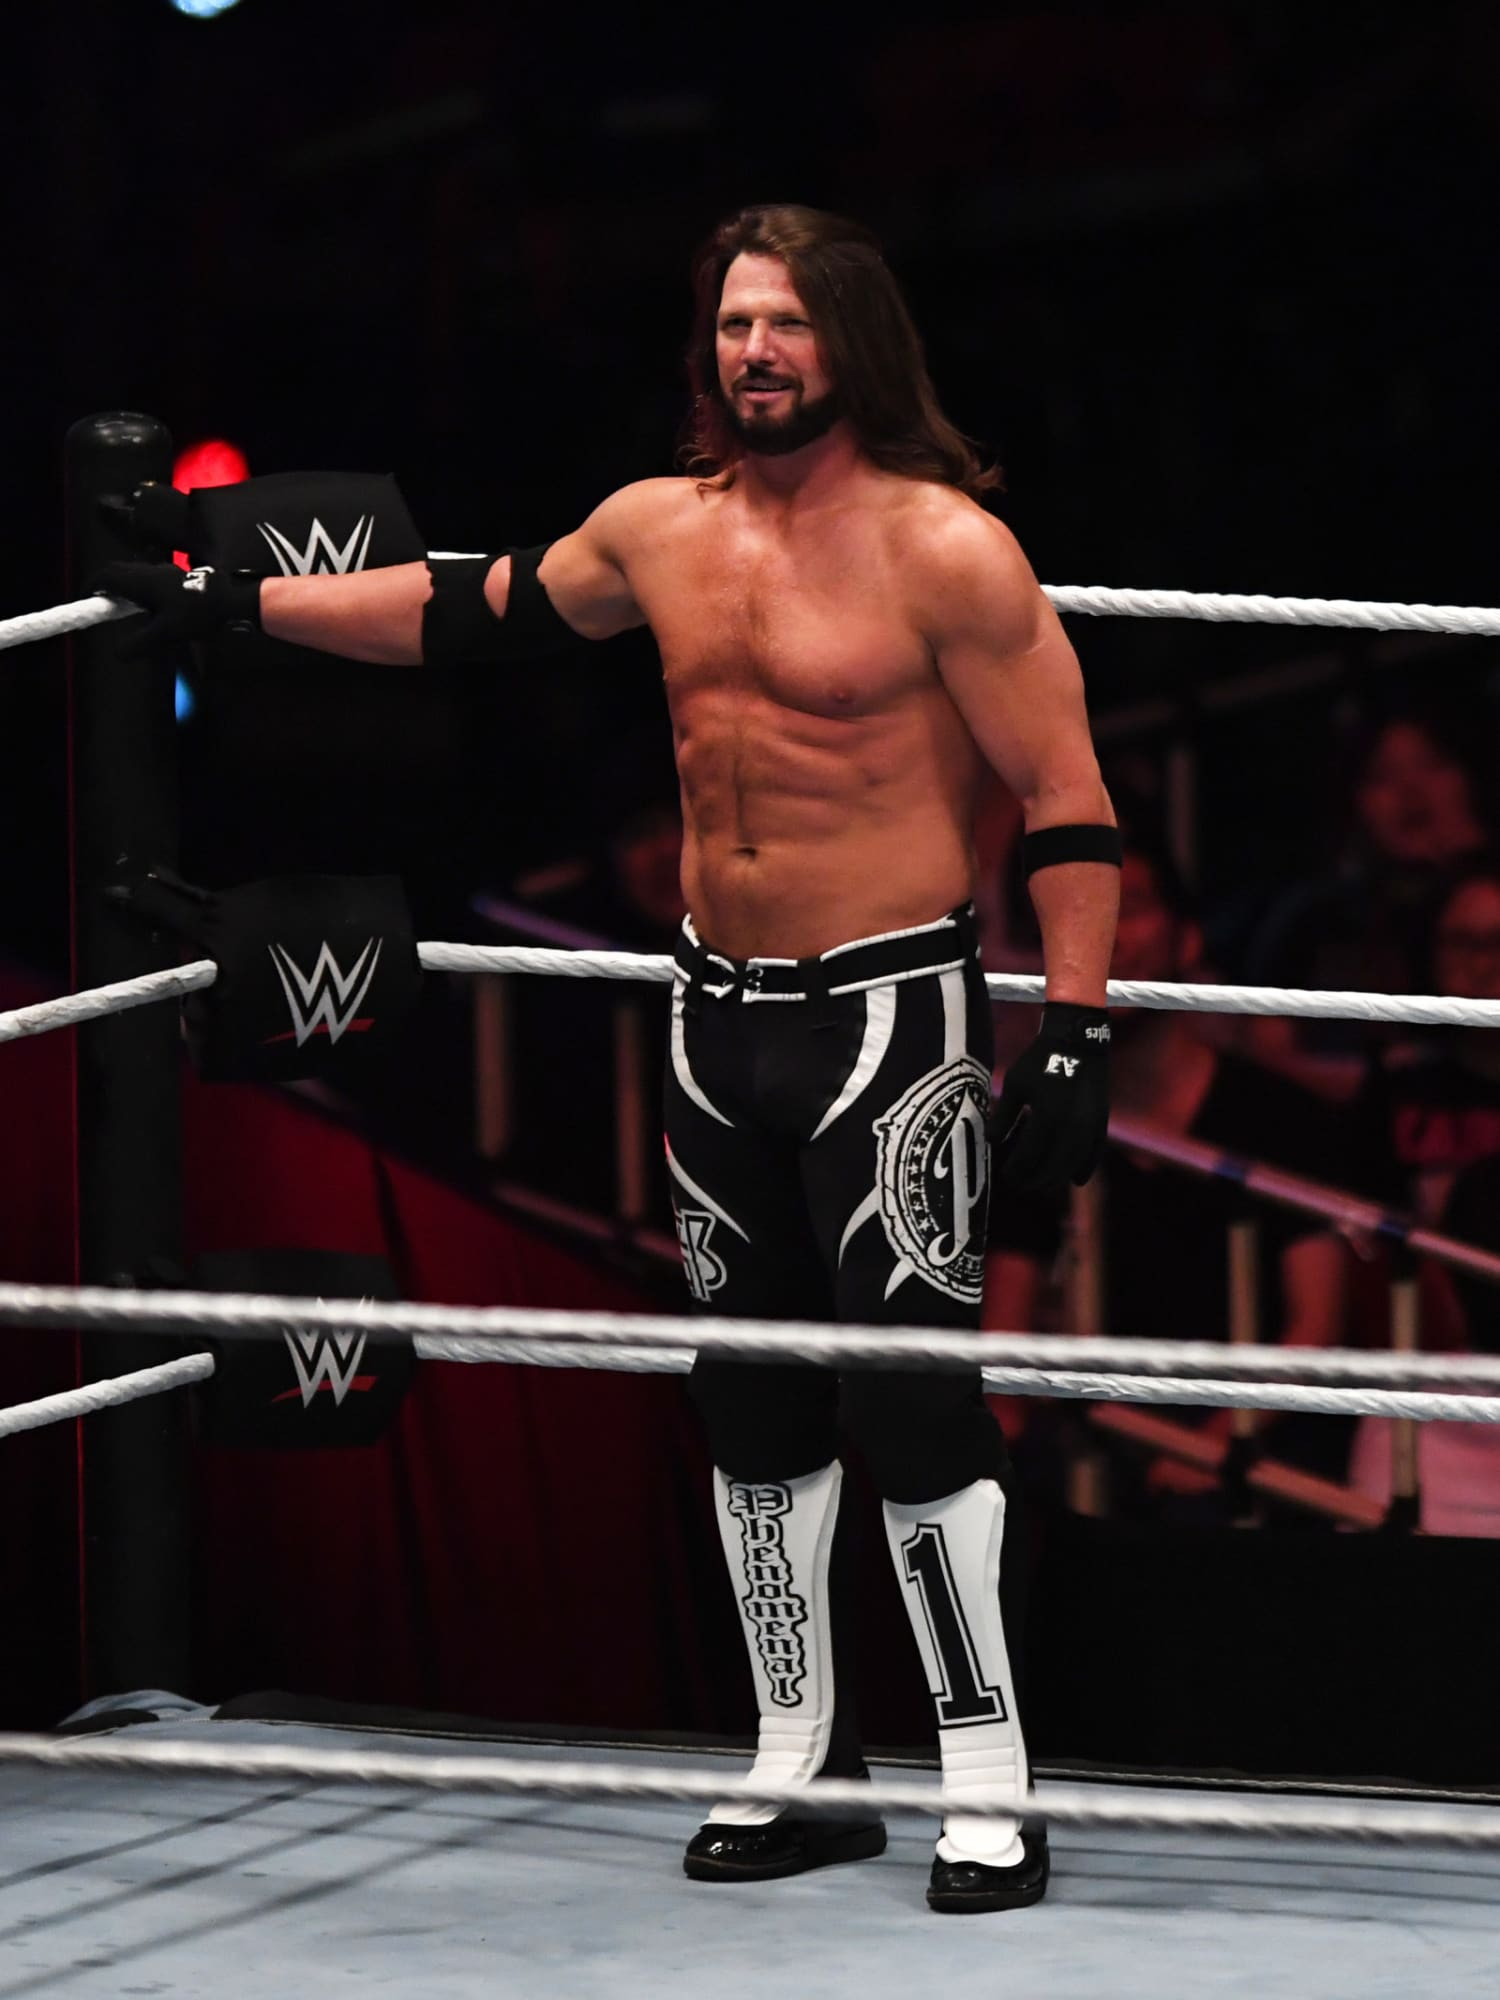 WWE should book AJ Styles/Drew McIntyre for WrestleMania 37